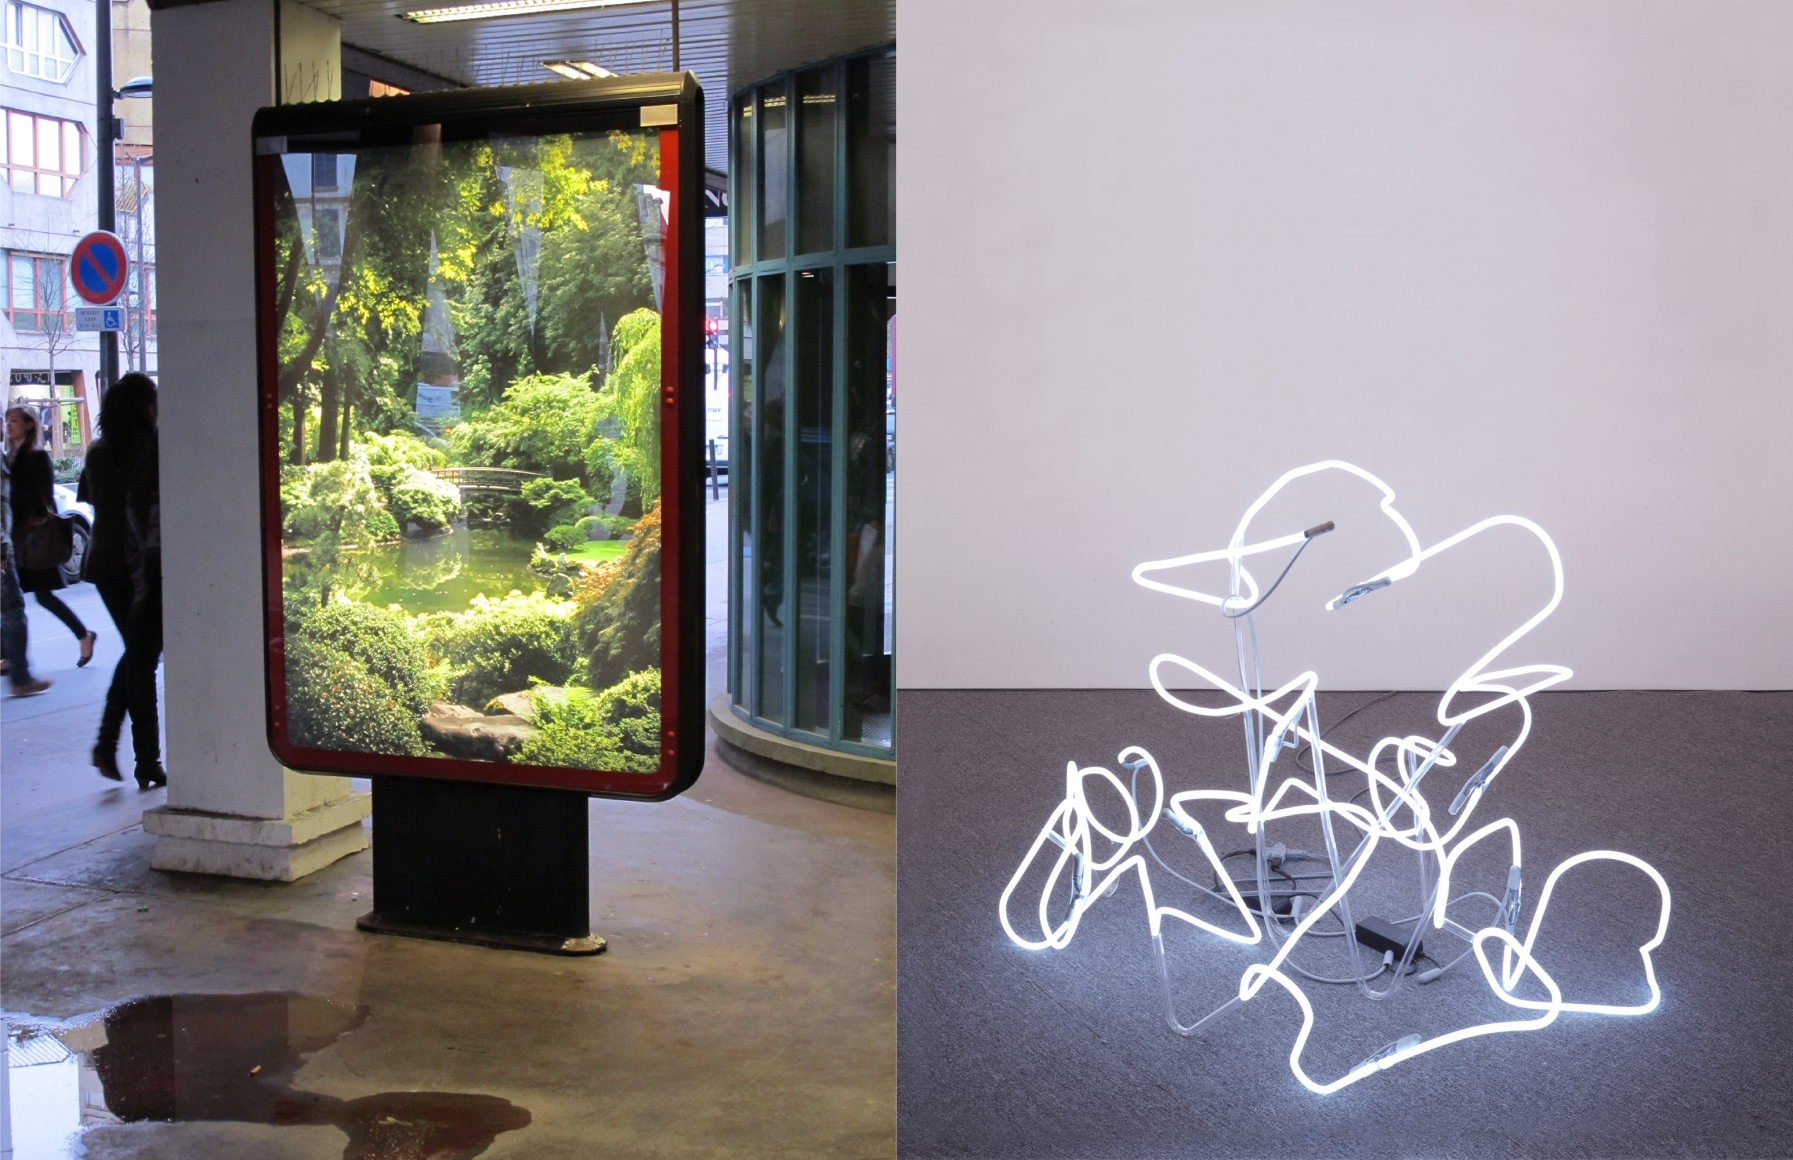 Interior view of Peter Coffin, A, E, I, O, U, published by Venus Over Manhattan, New York, 2012